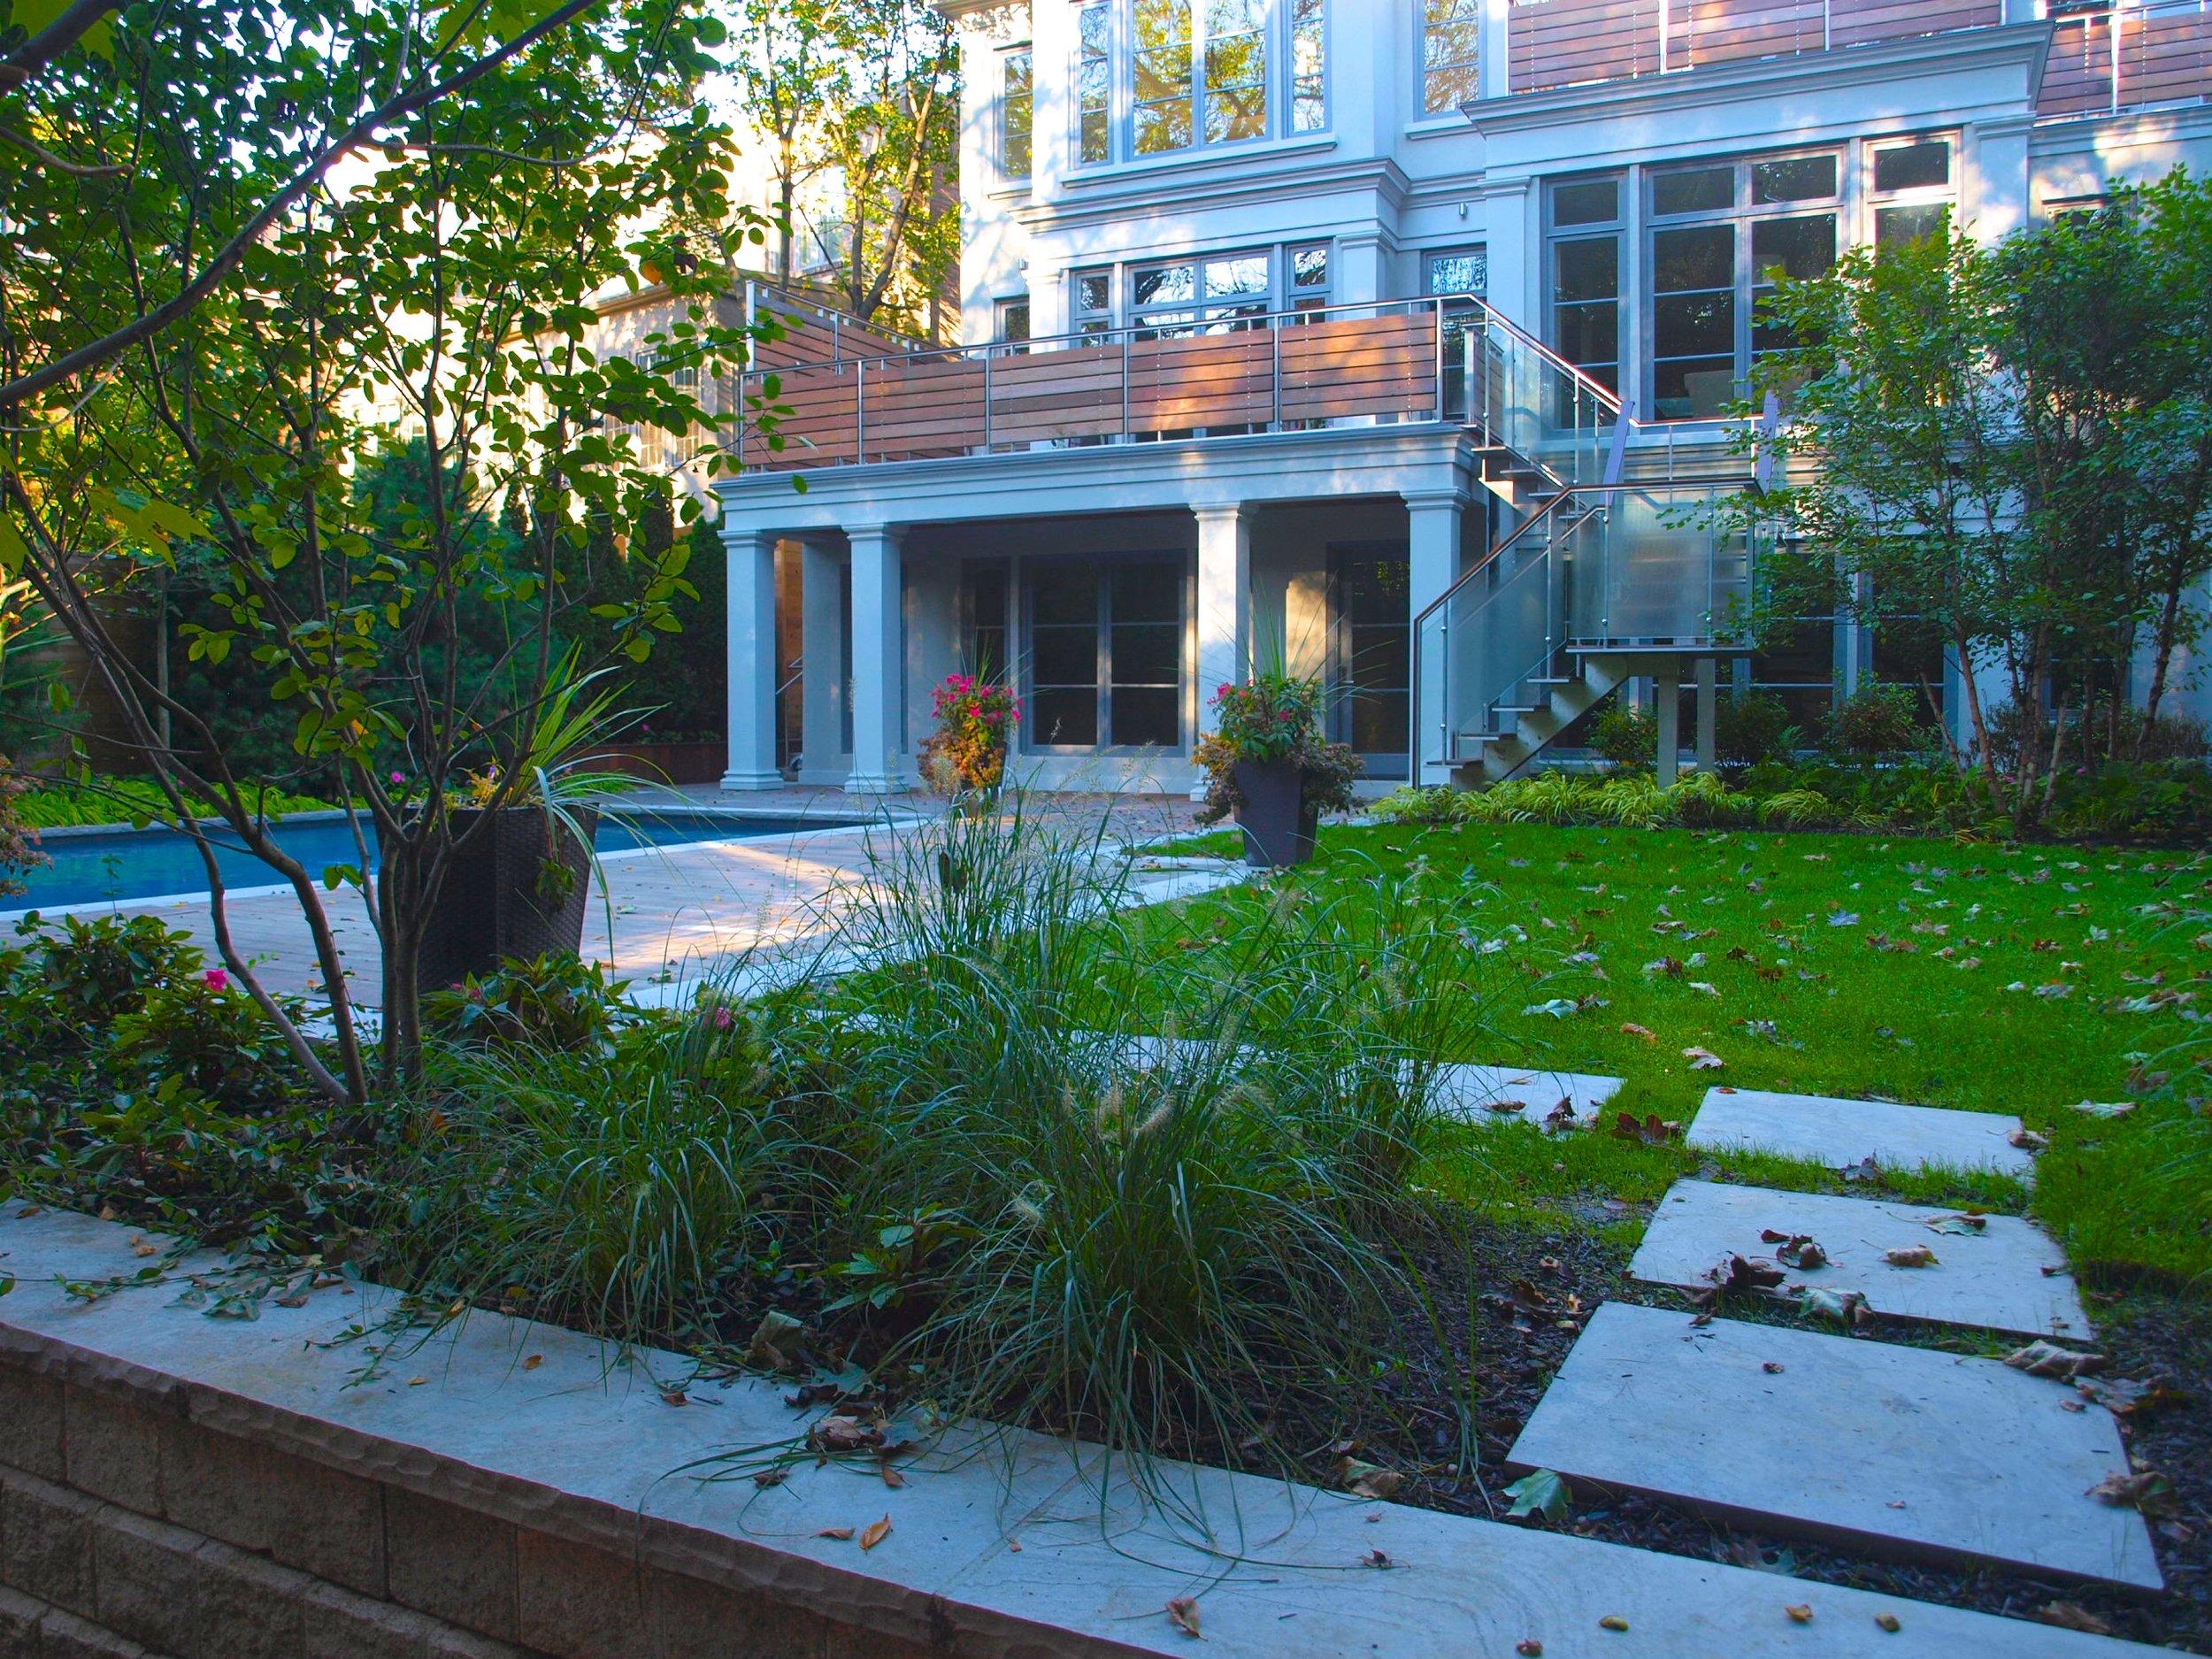 ipe decking, parkscape, custom, ornamental grasses, stepping stones, planting, betz pools, stonework, cedar fencing, glass railing, forest hill